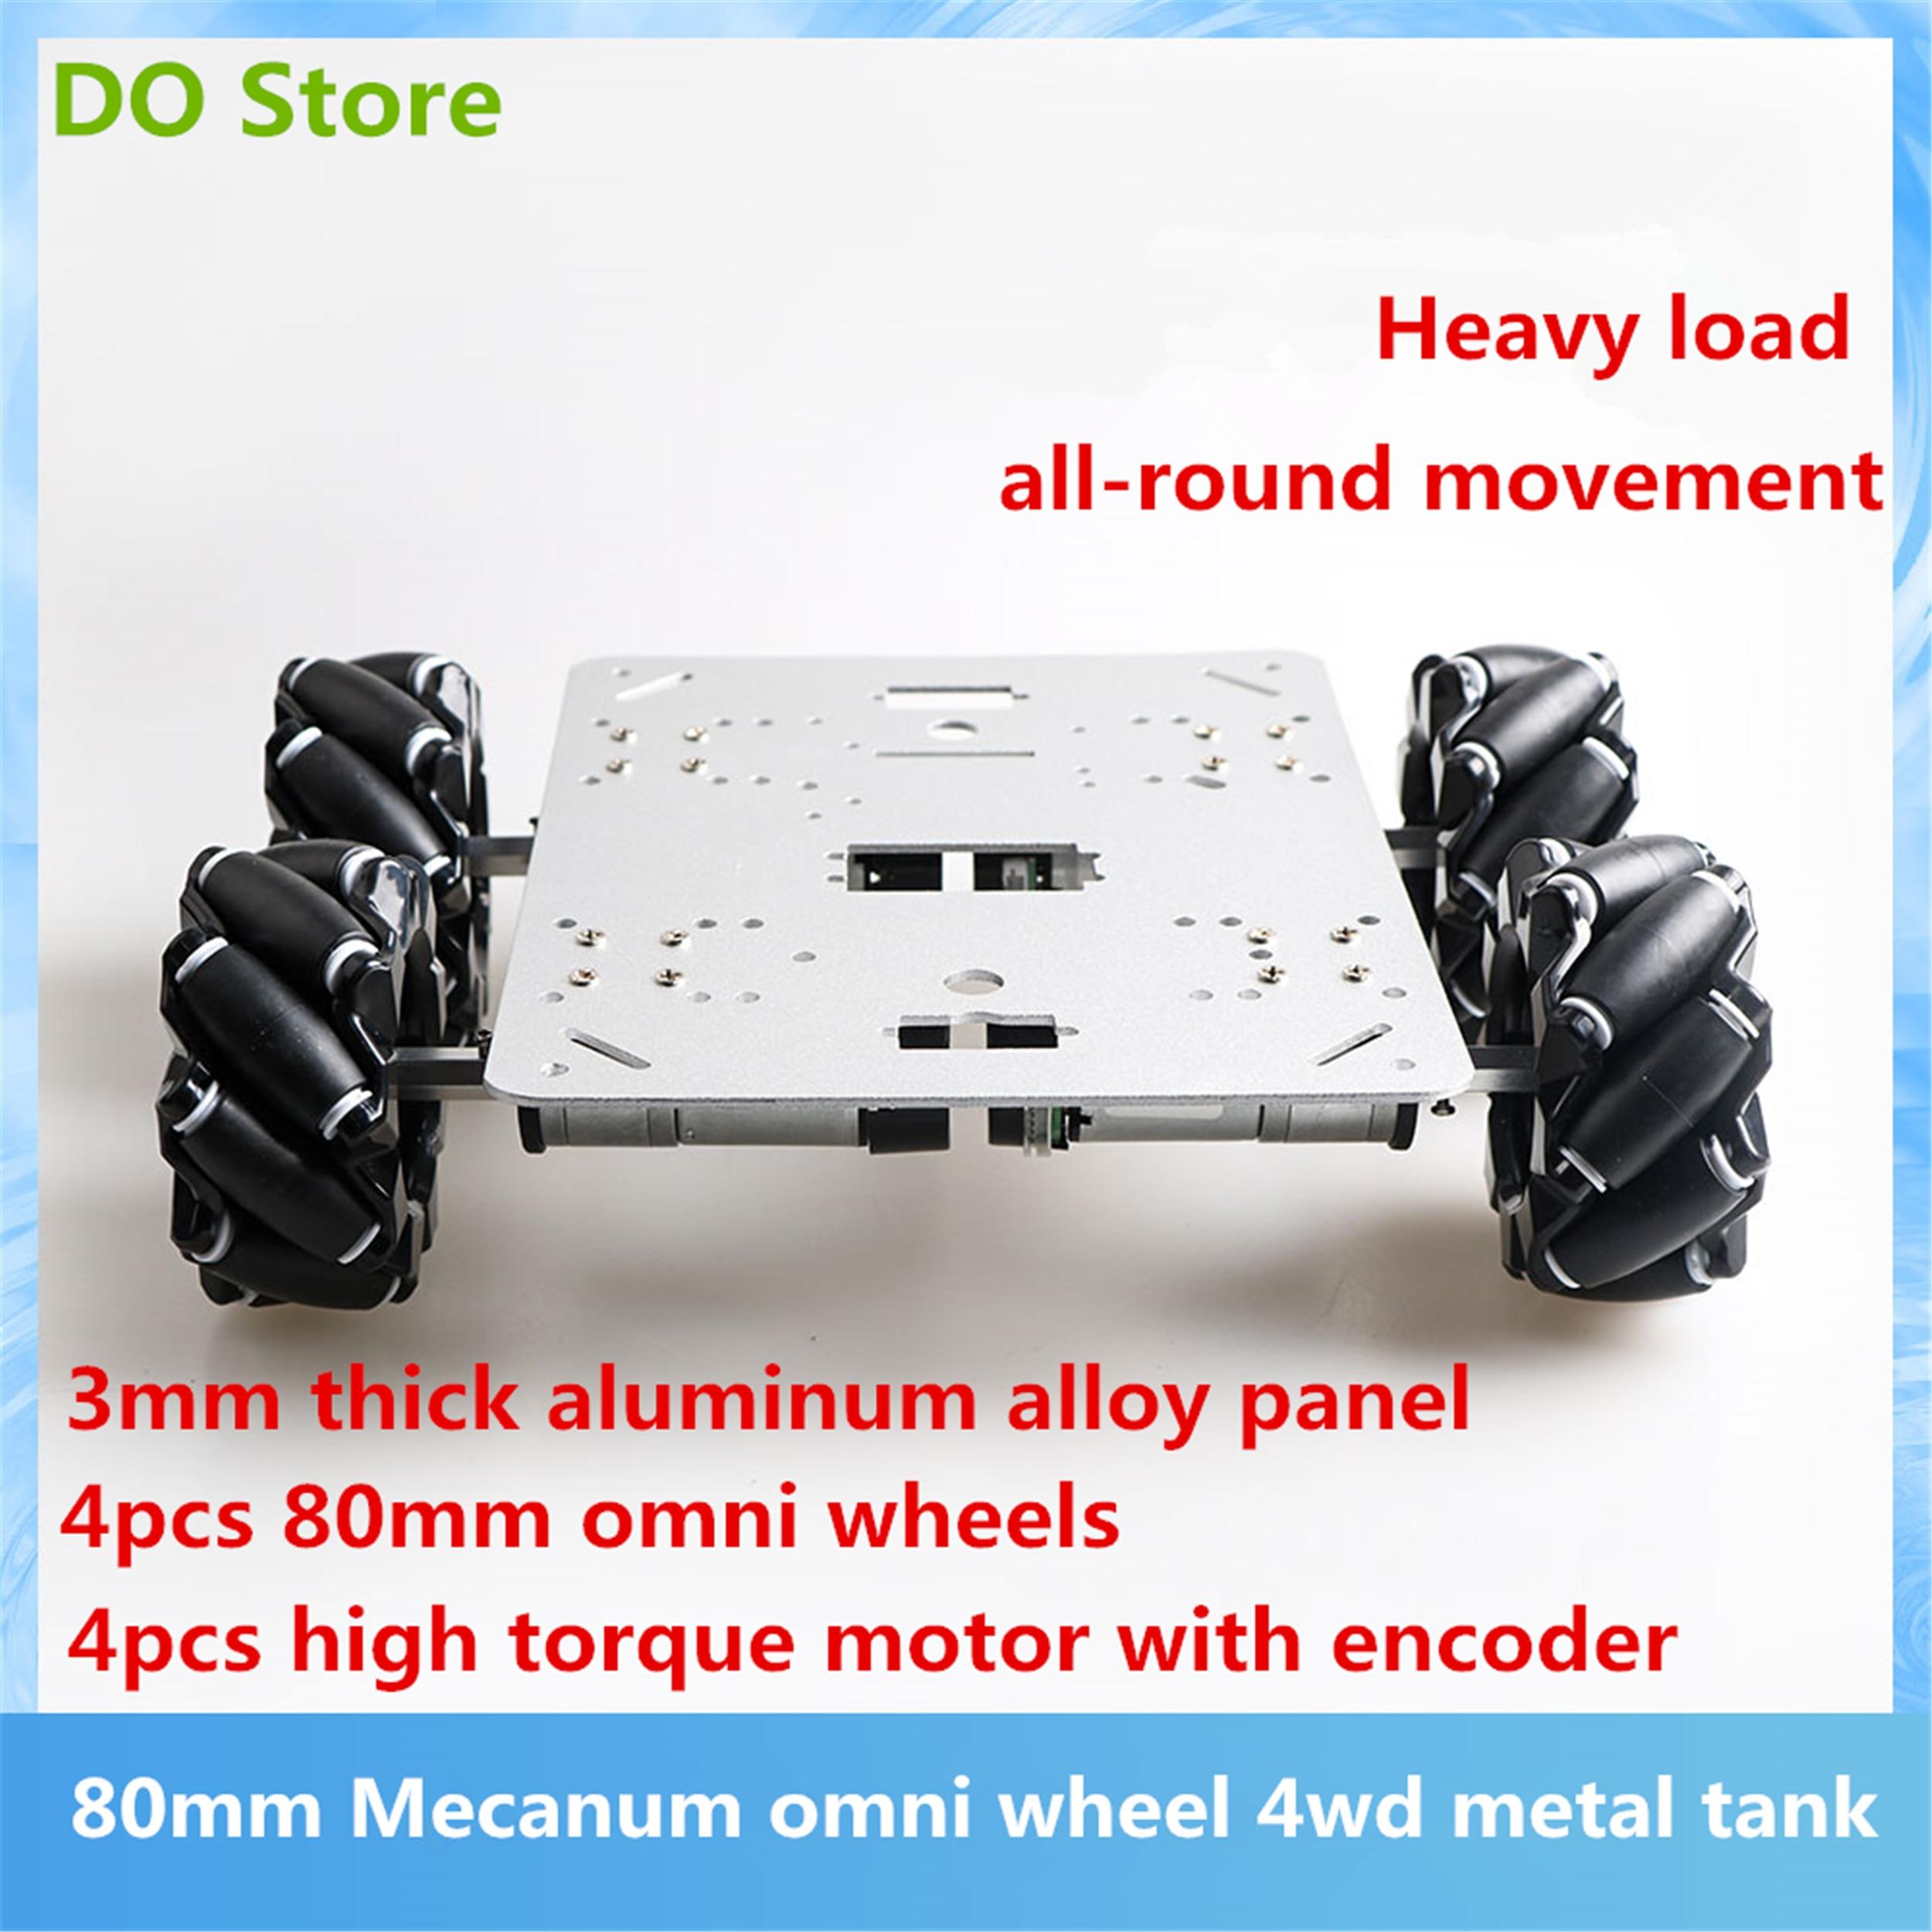 Armazene 80mm roda omnidirecional 4wd grande tanque de metal chassis kit 12 v dc motor com codificador diy ros/plataforma deriva